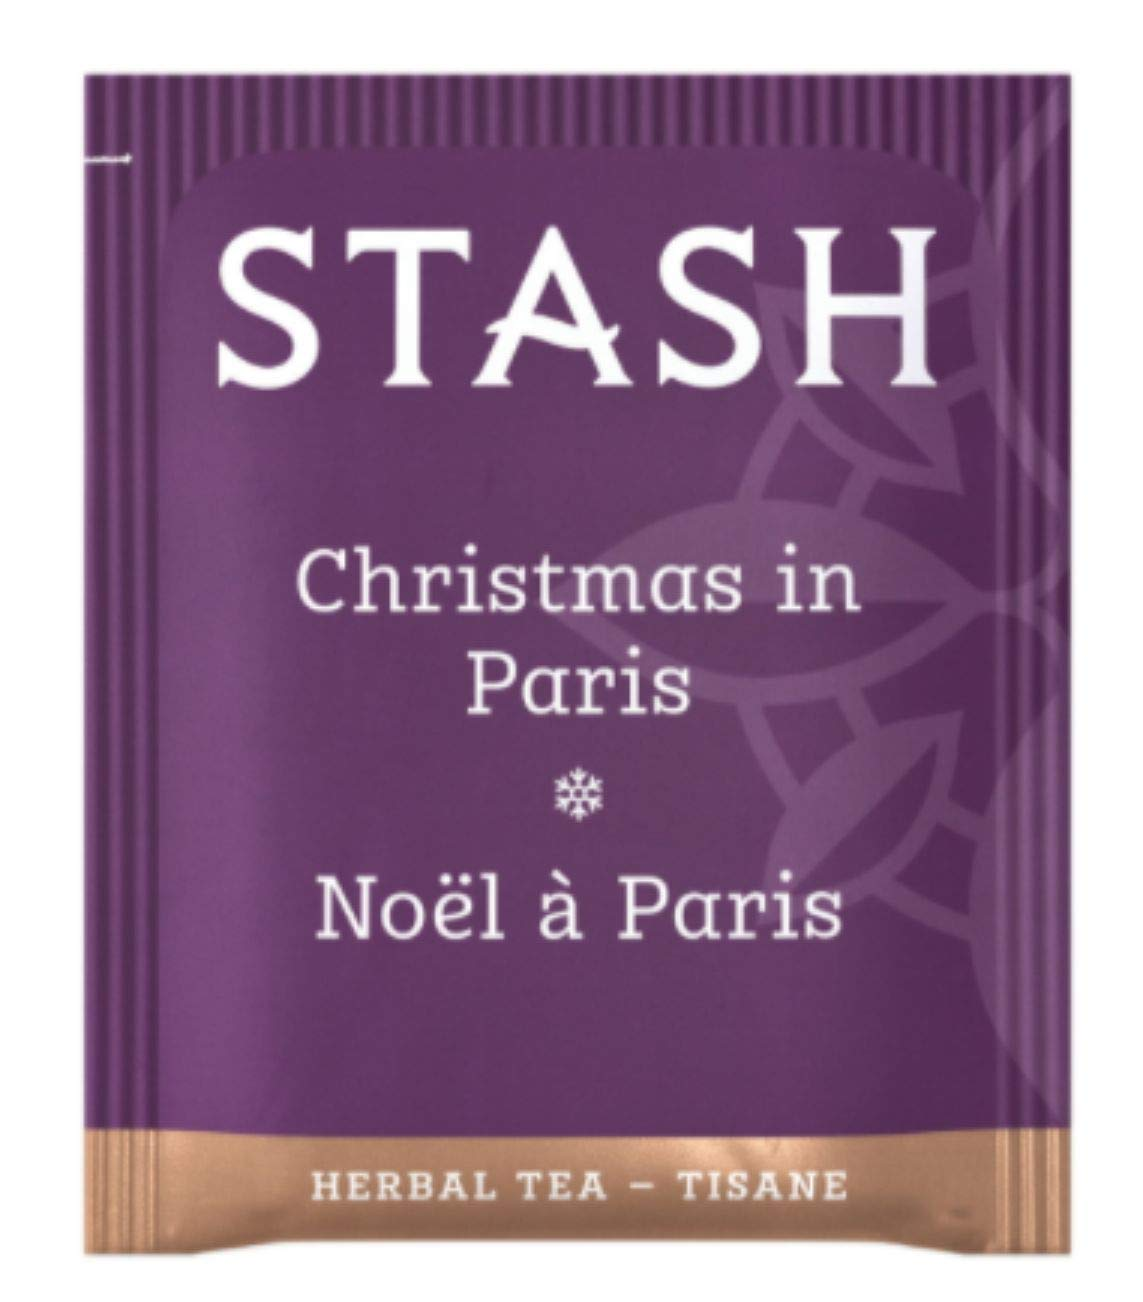 Stash Tea Teabags Christmas In Paris 100 Count Box of Tea Bags in Foil